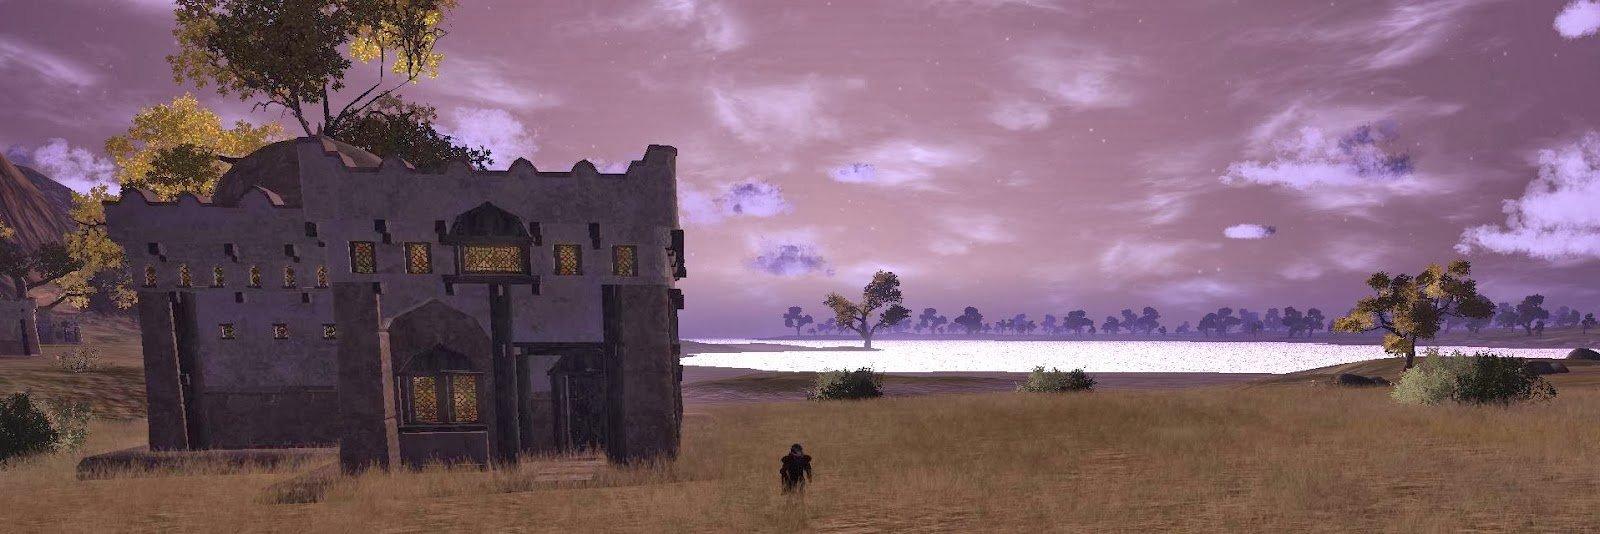 EverQuest vanguard: saga of heroes